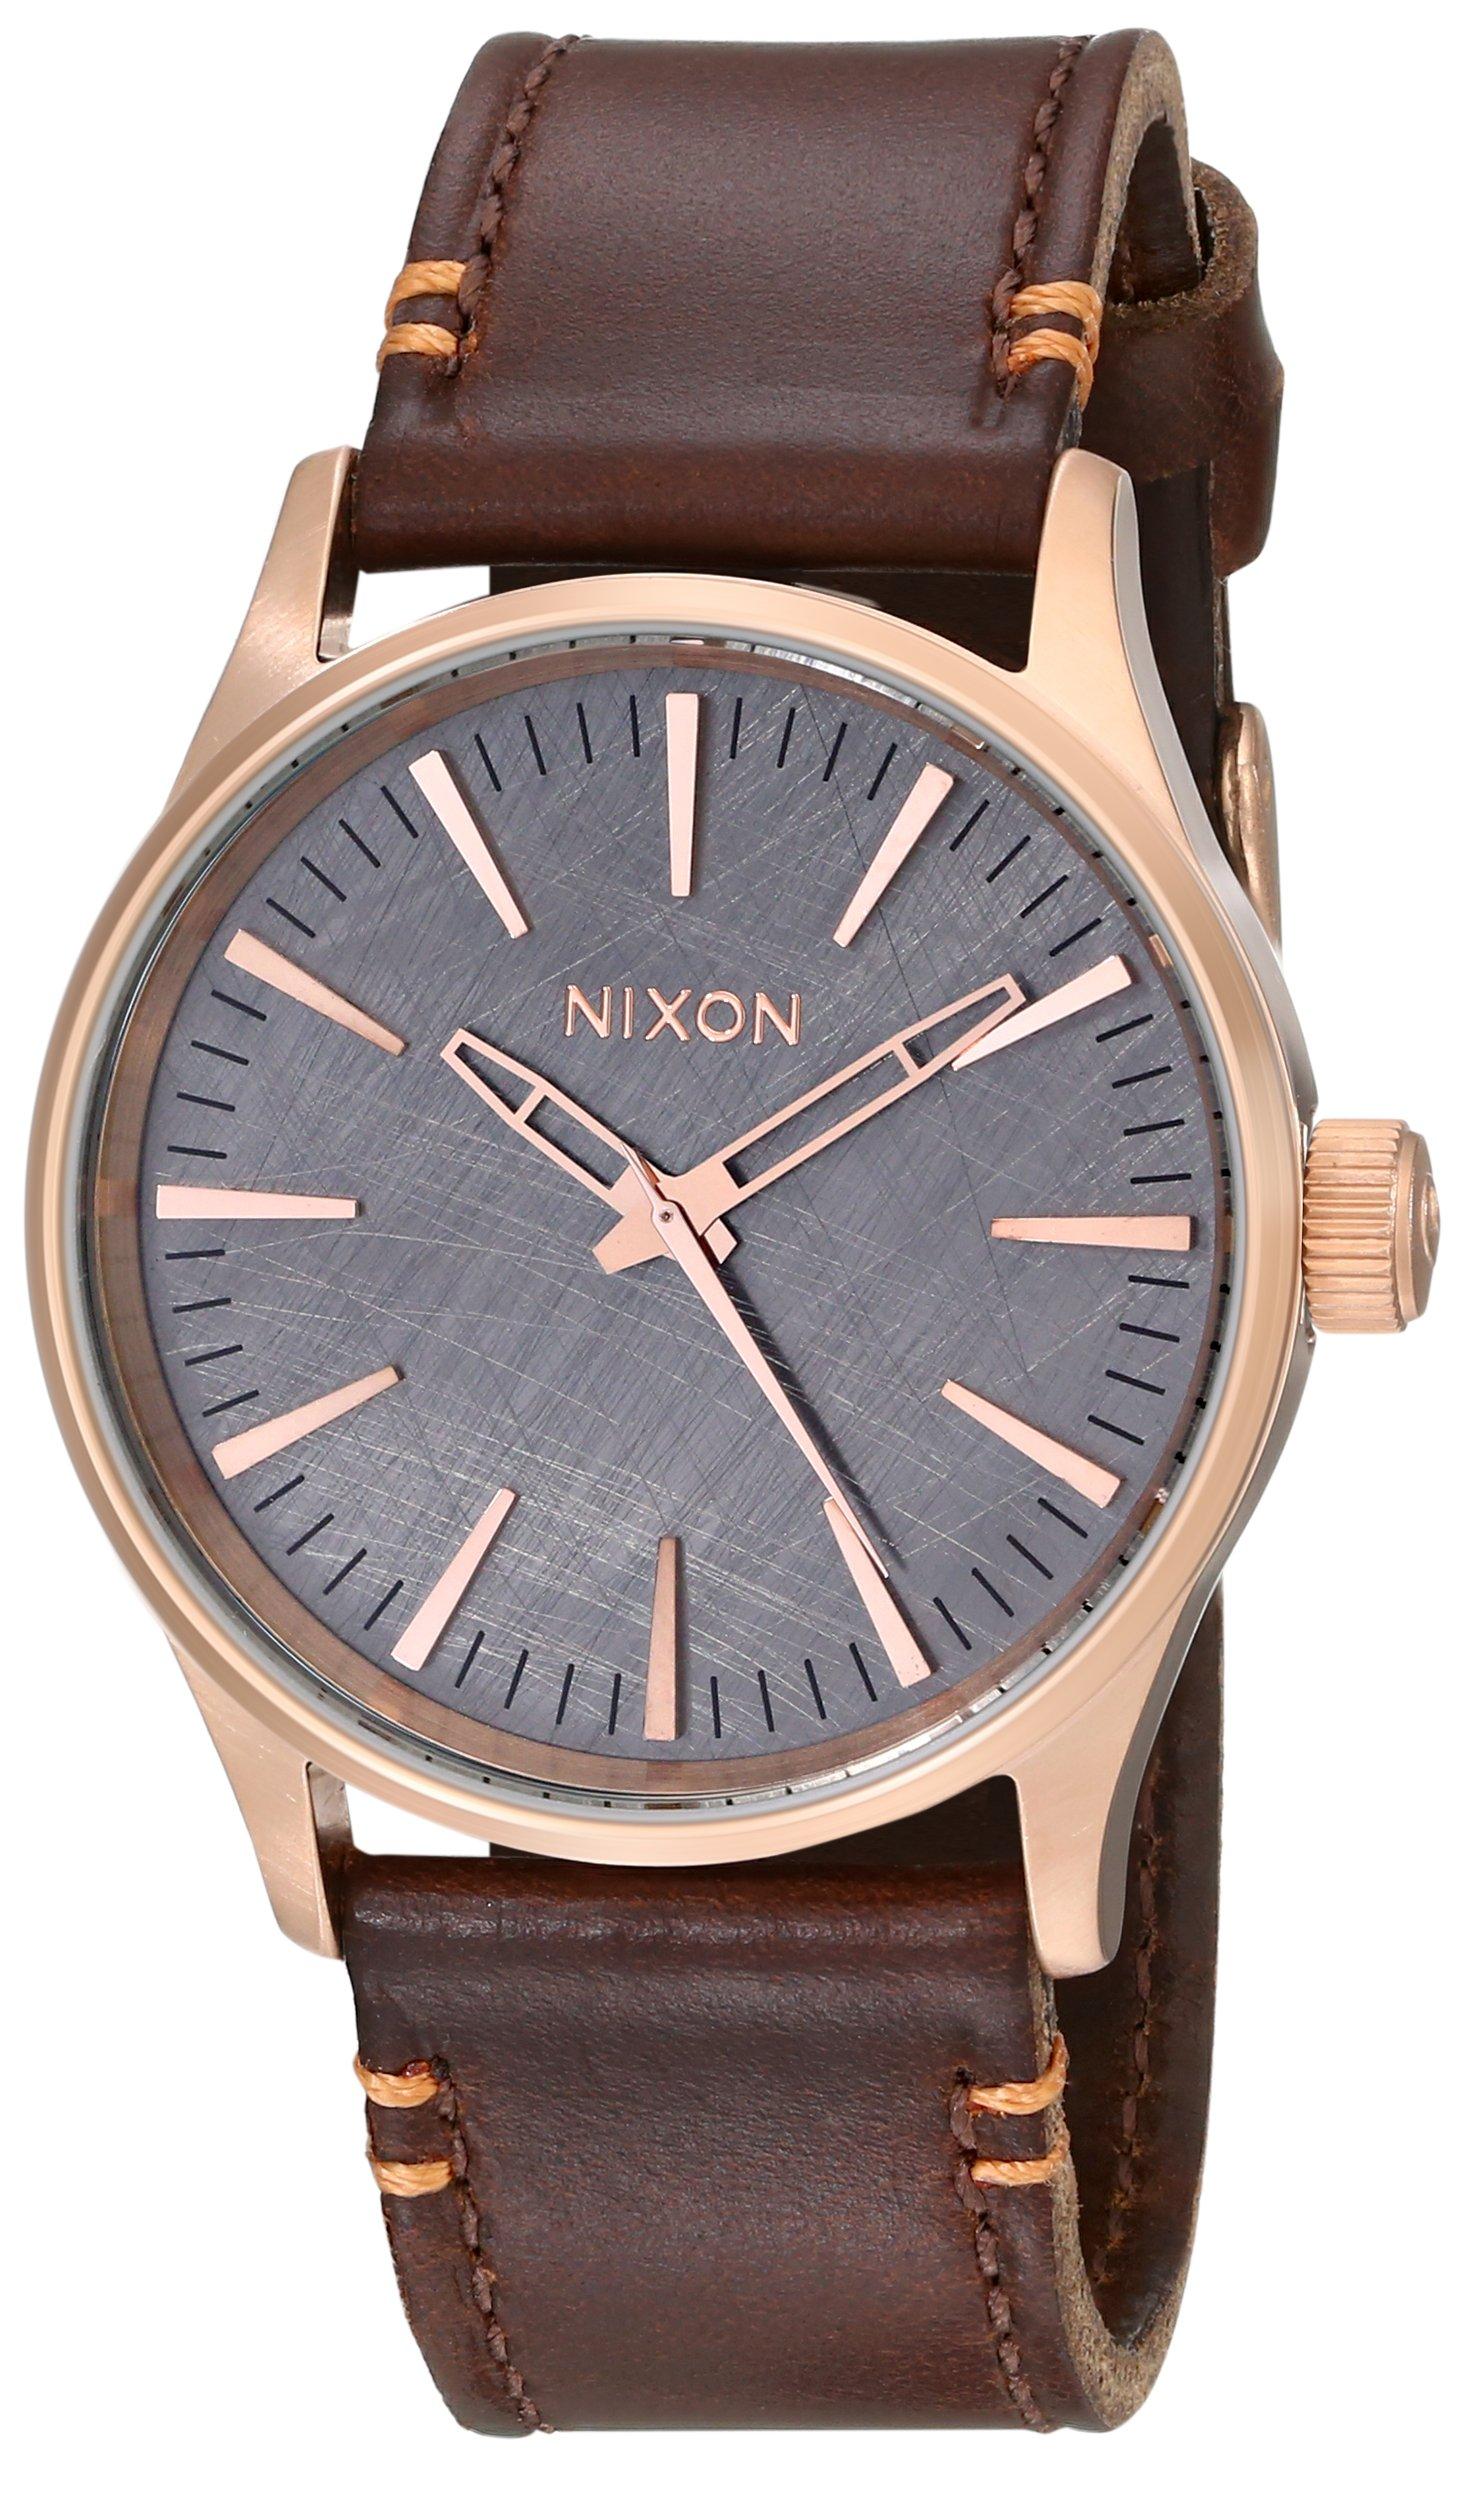 Nixon Men's A3772001 Sentry 38 Leather Watch by NIXON